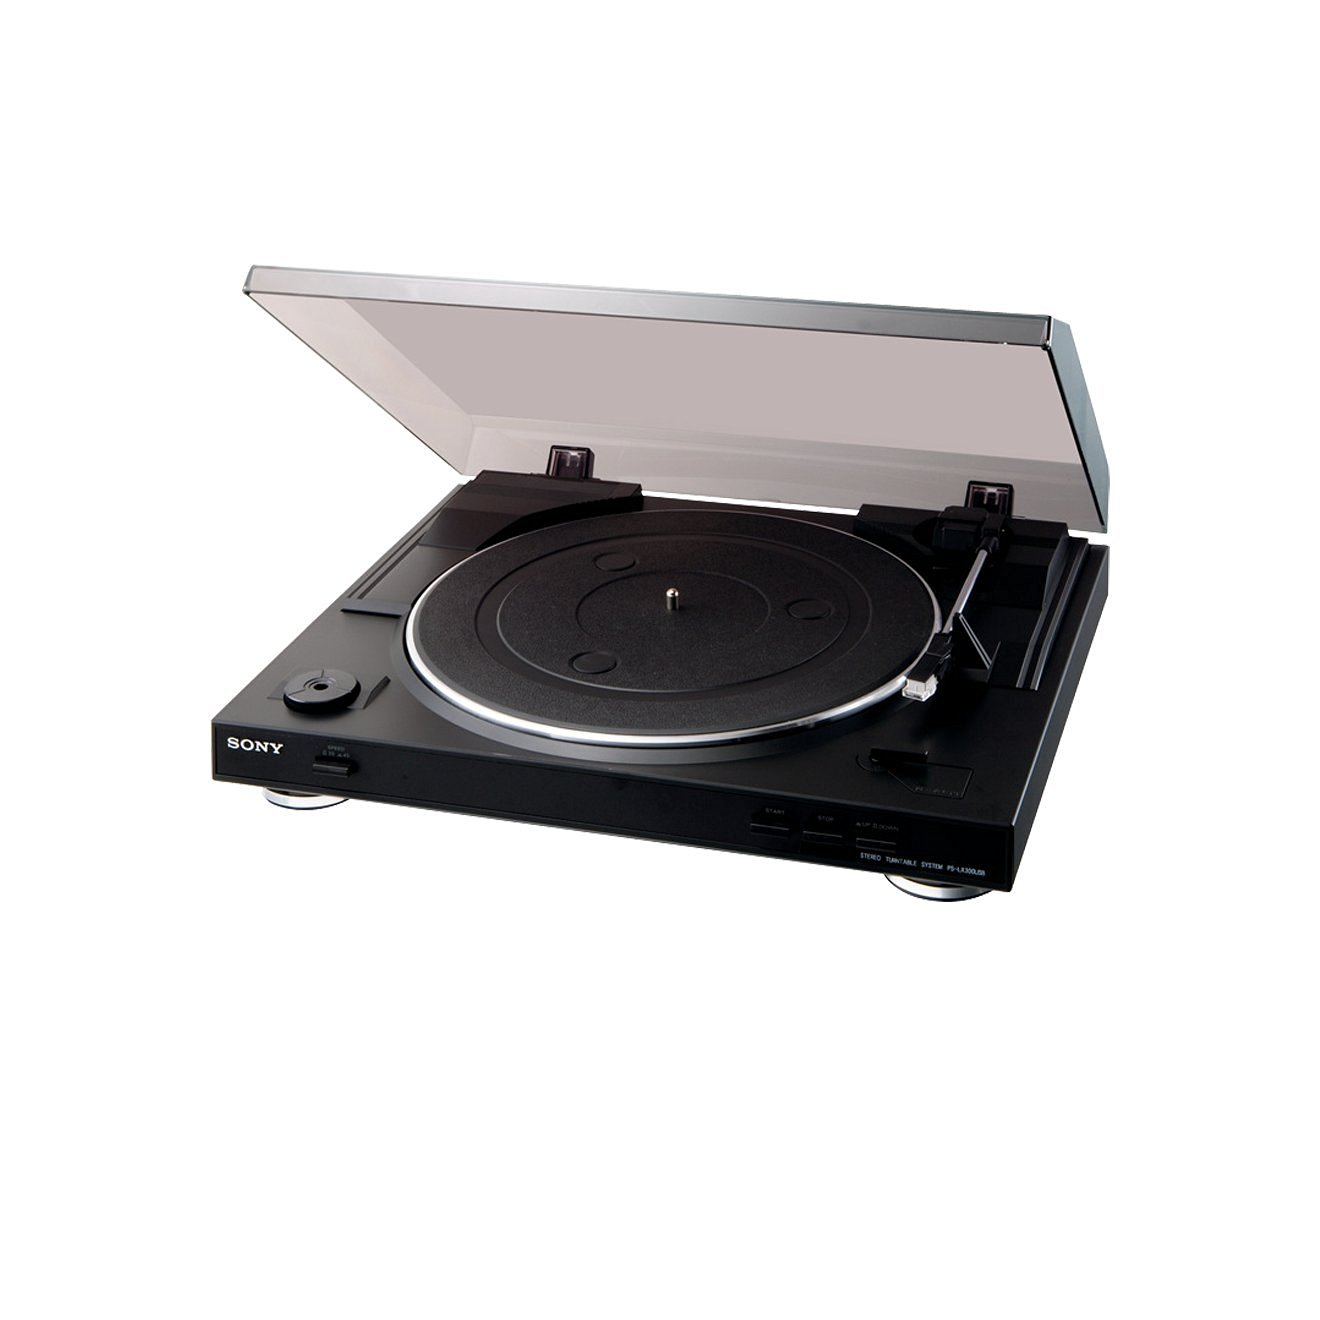 Sony PSLX300USB USB Stereo Turntable best turntable under $200